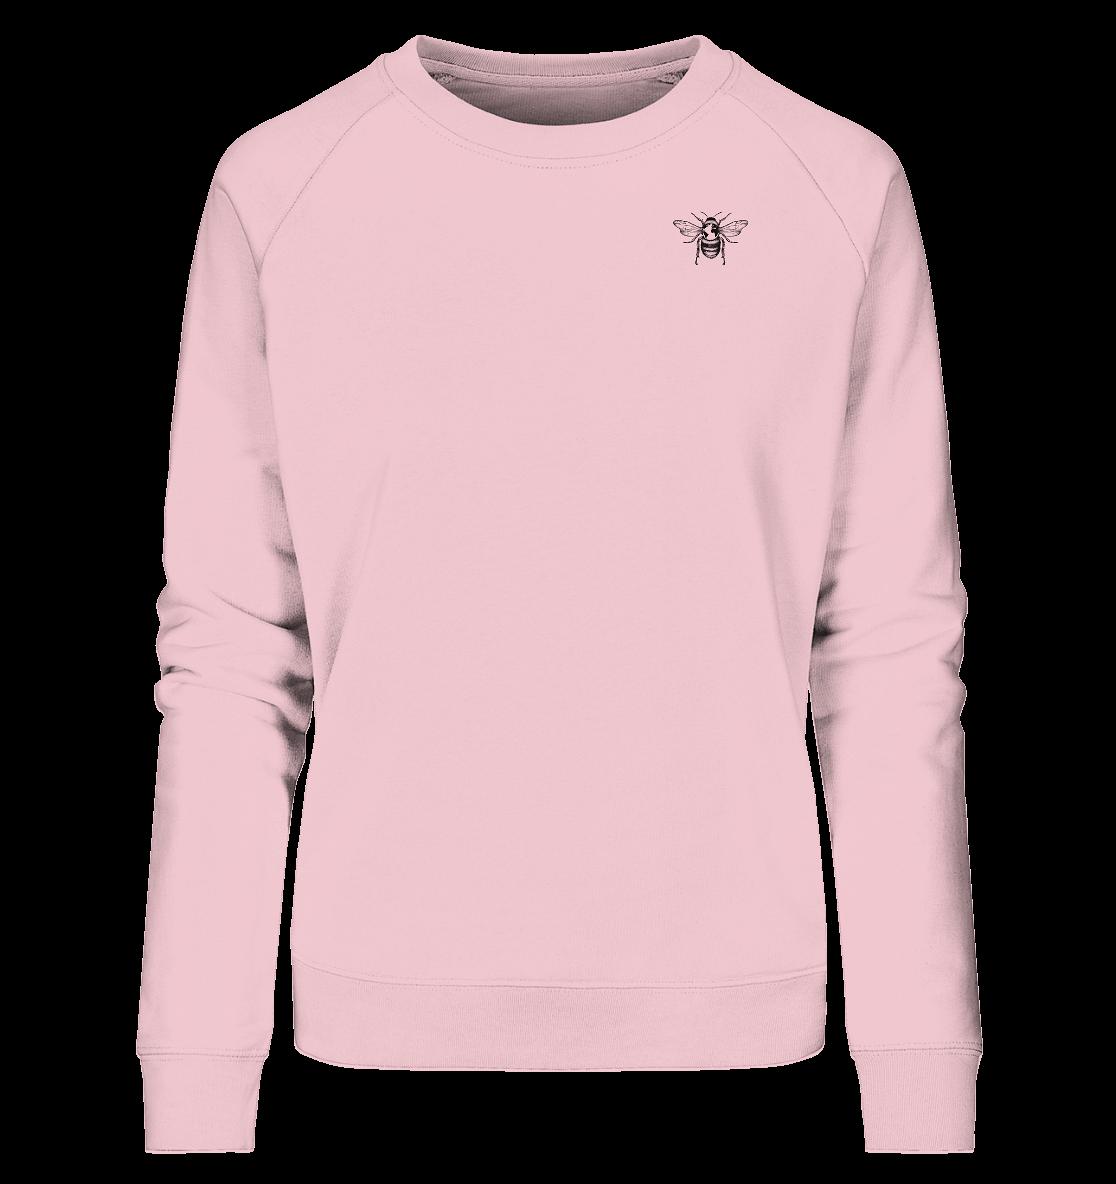 front-ladies-organic-sweatshirt-f2c9d0-1116x.png